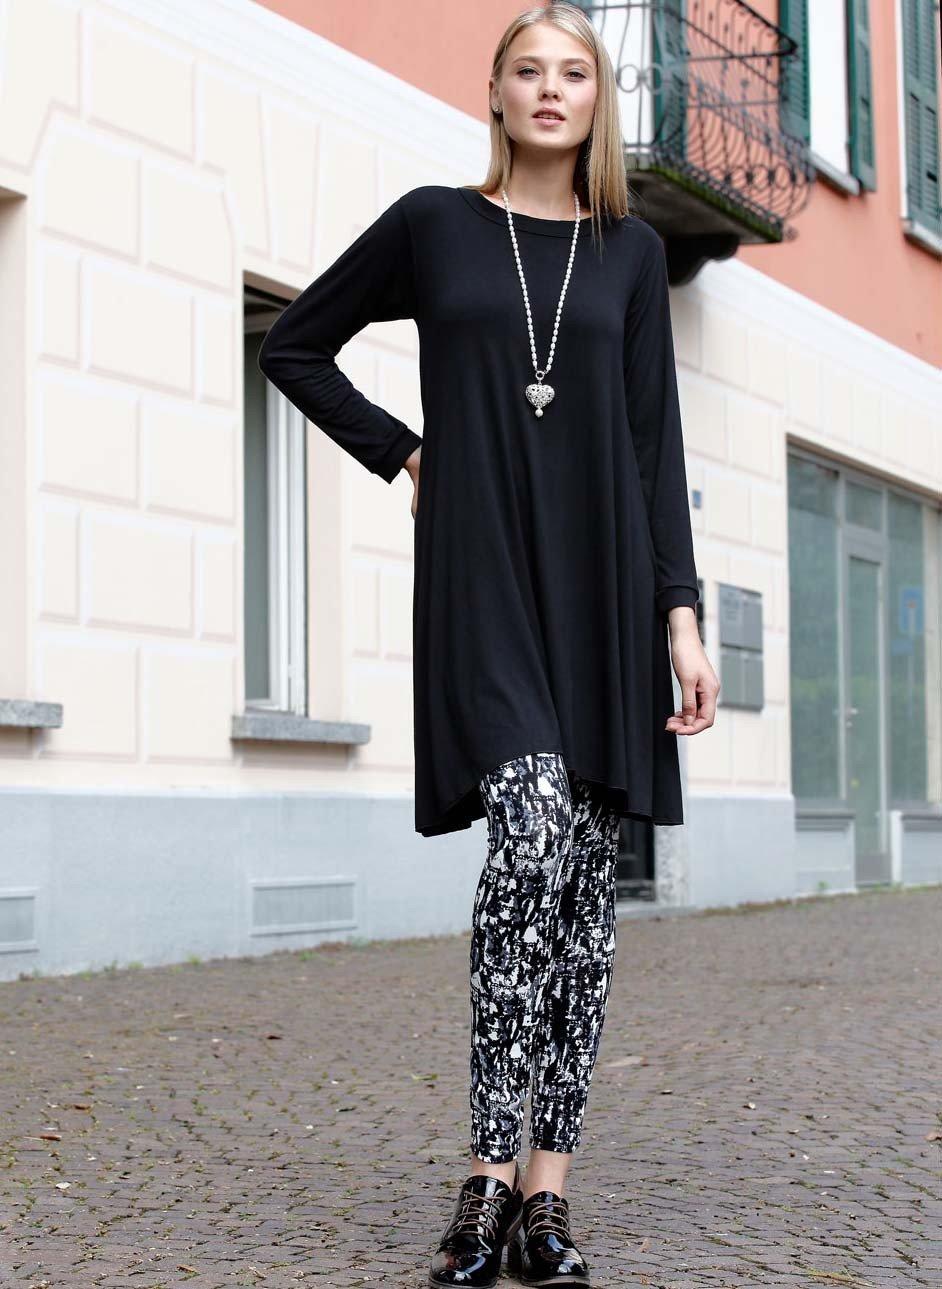 Leggings Grafikprint schwarz/grau/weiss